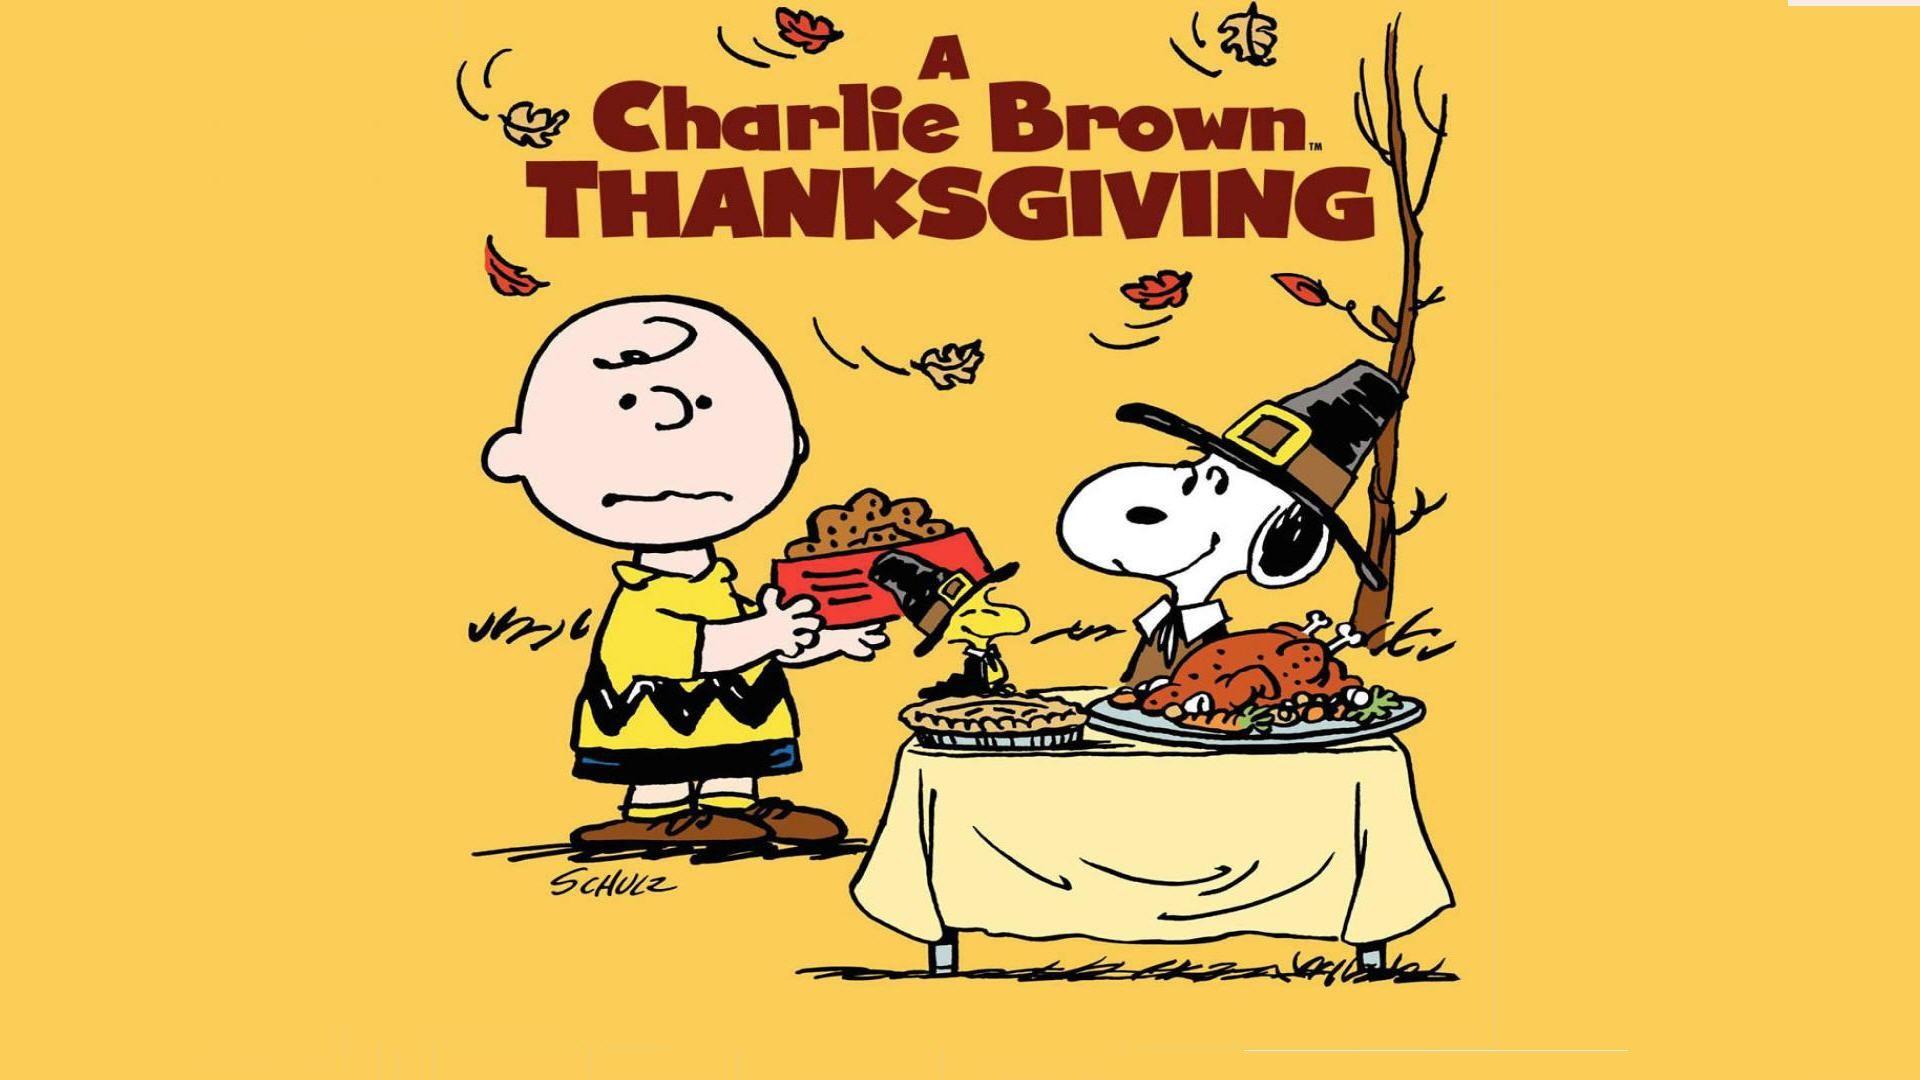 Charlie Brown Thanksgiving Wallpaper - Charlie Brown Thanksgiving Abc 2019 - HD Wallpaper